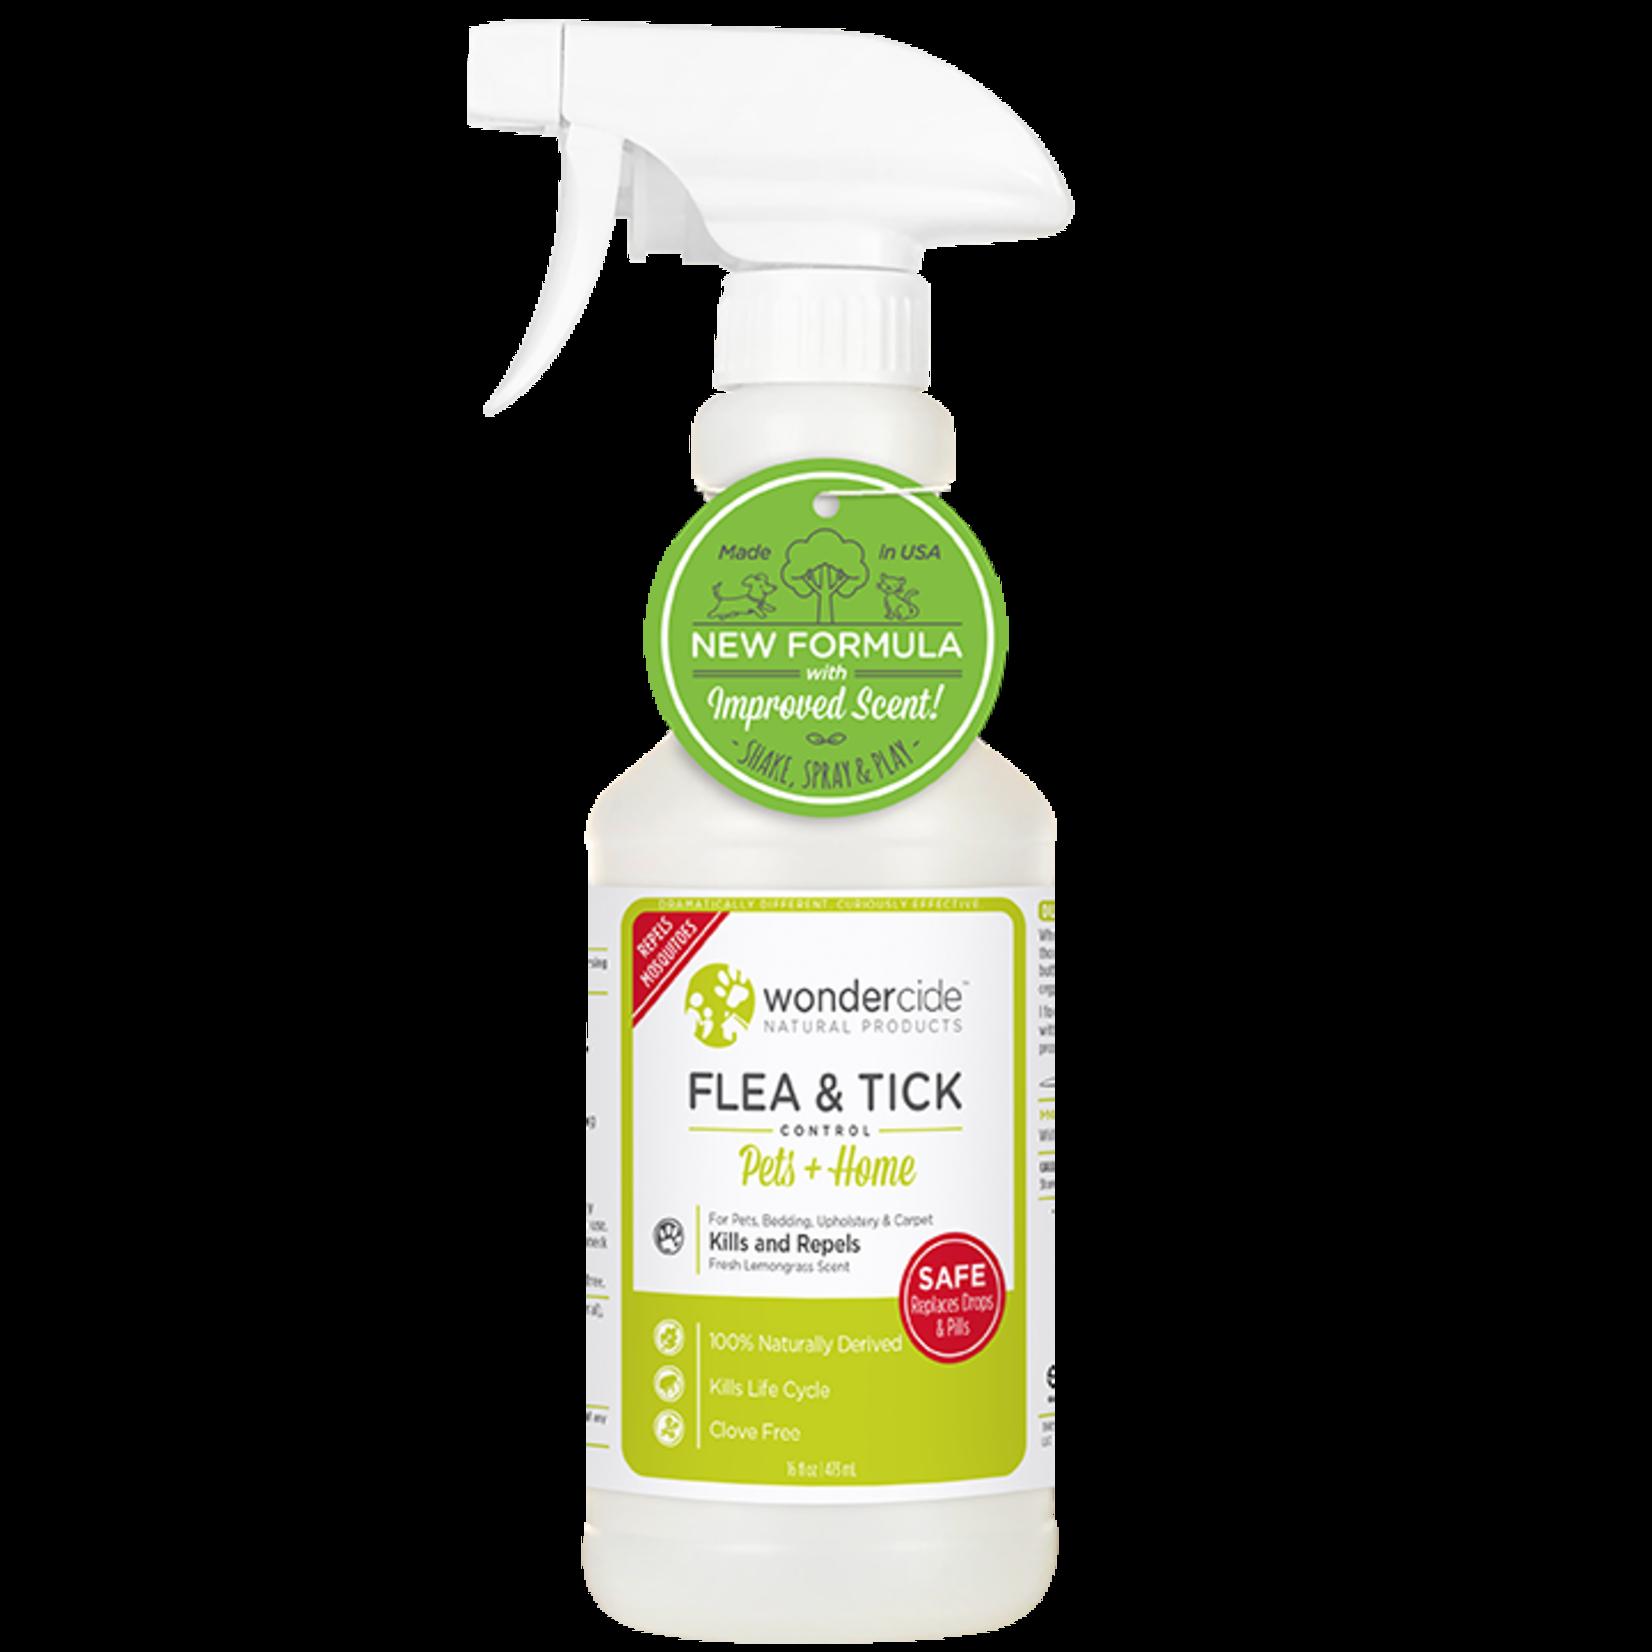 Wondercide WONDERCIDE Flea & Tick Spray Lemongrass